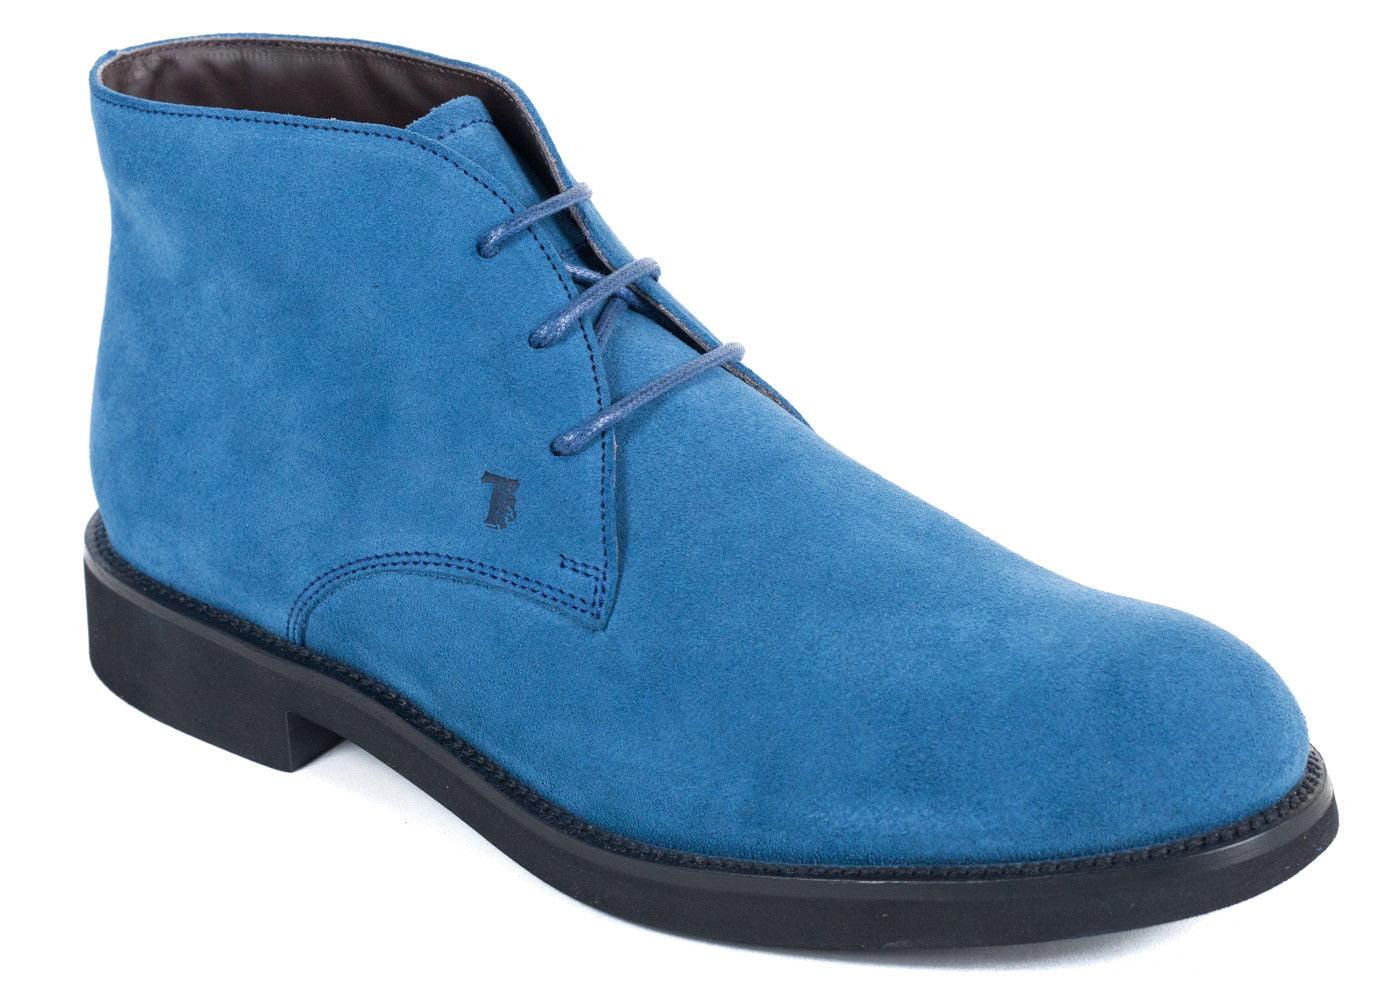 40ea9b0e2 Tod s - Tods Mens Ocean Blue Suede Desert Ankle Boots - Walmart.com